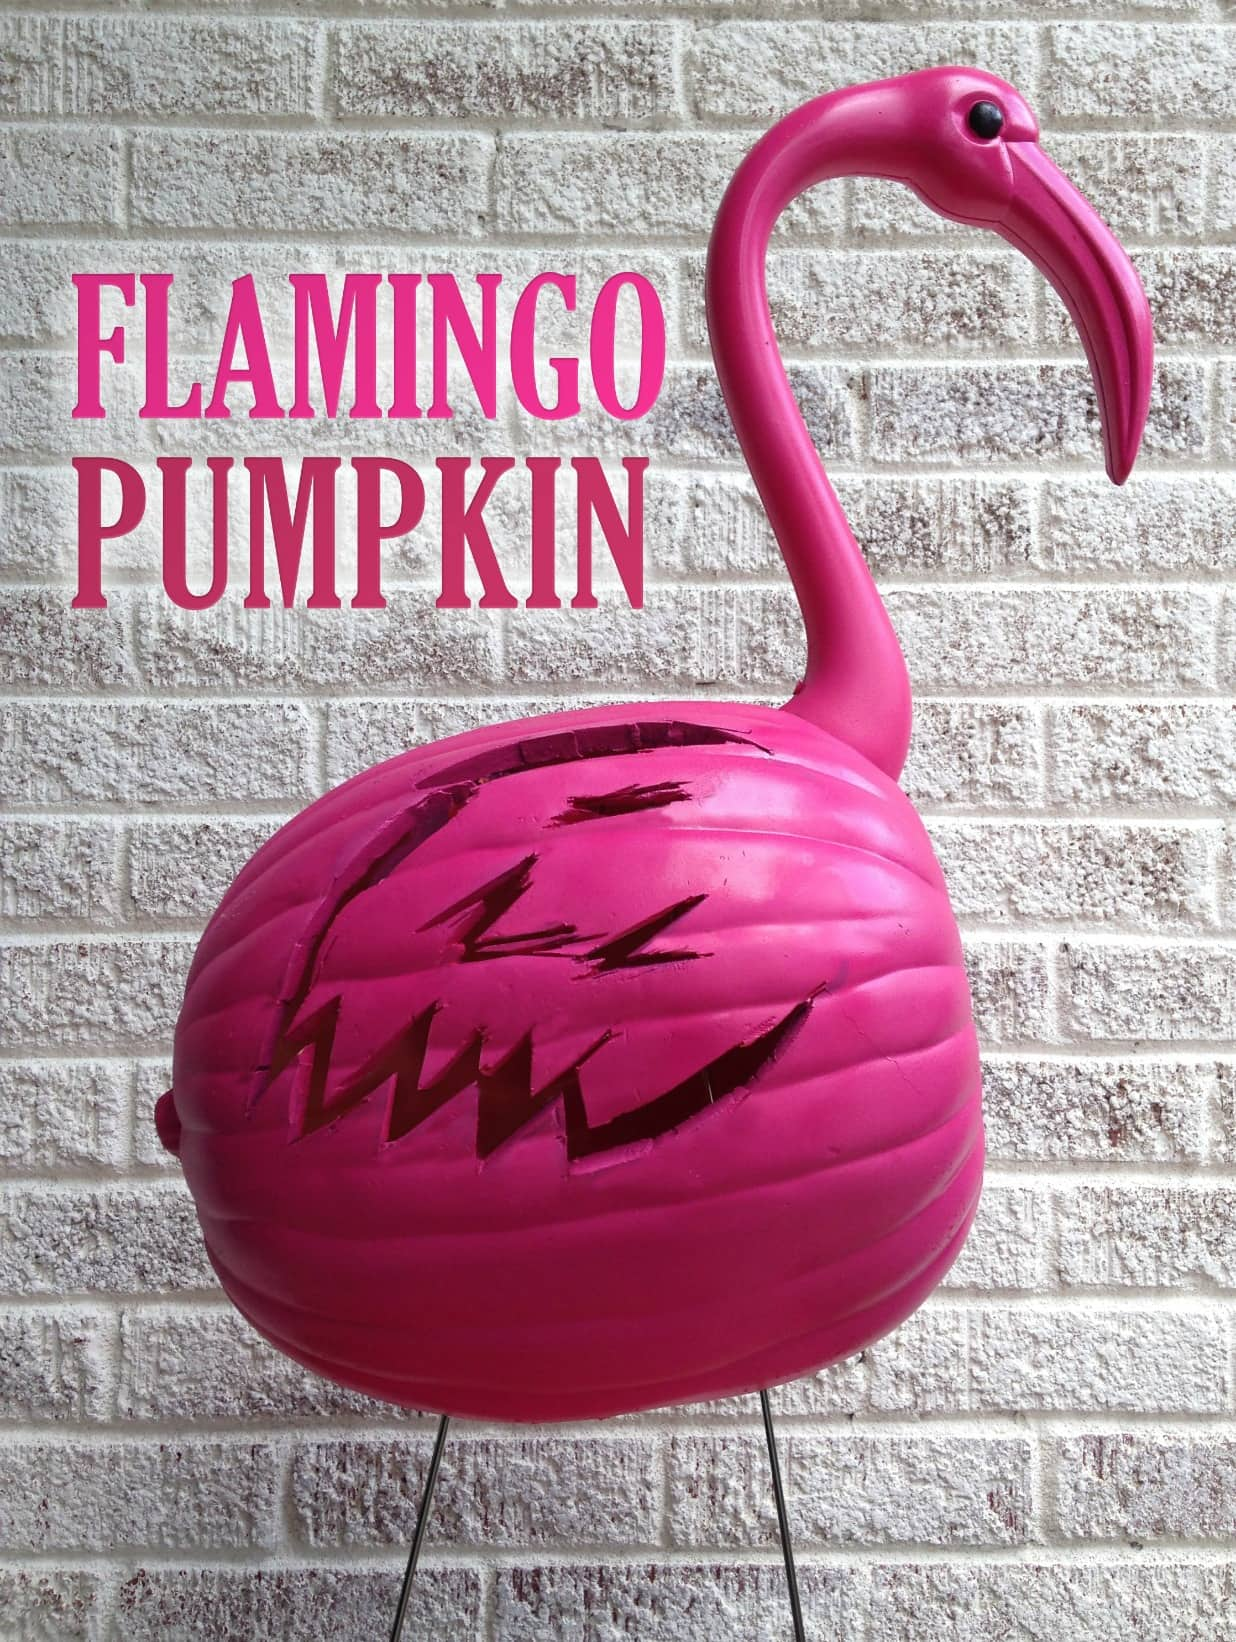 flamingo-pumpkin-types